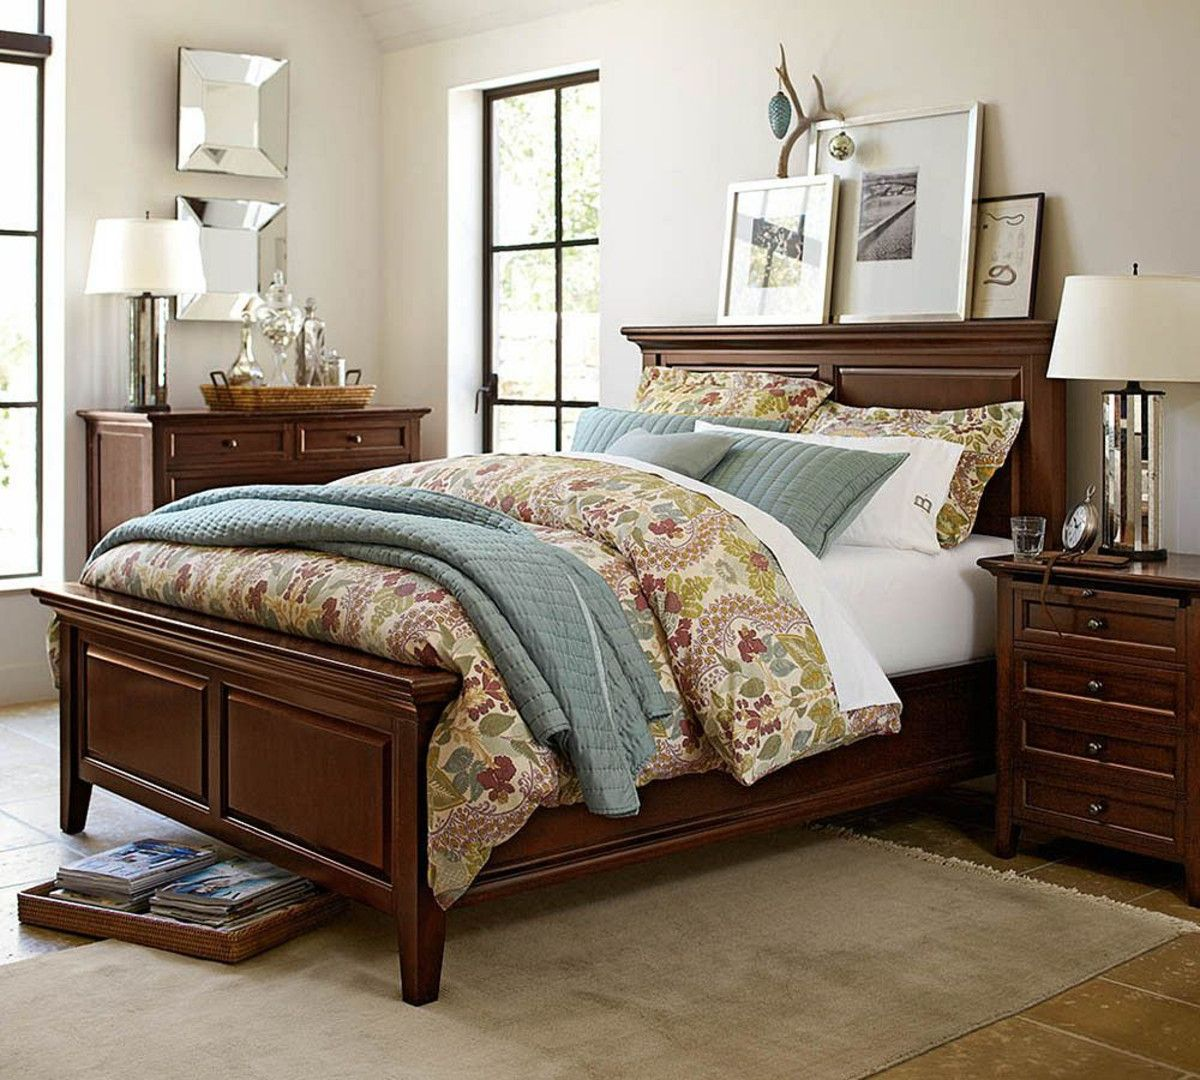 top 25 ideas about master bedroomspottery barn australia on